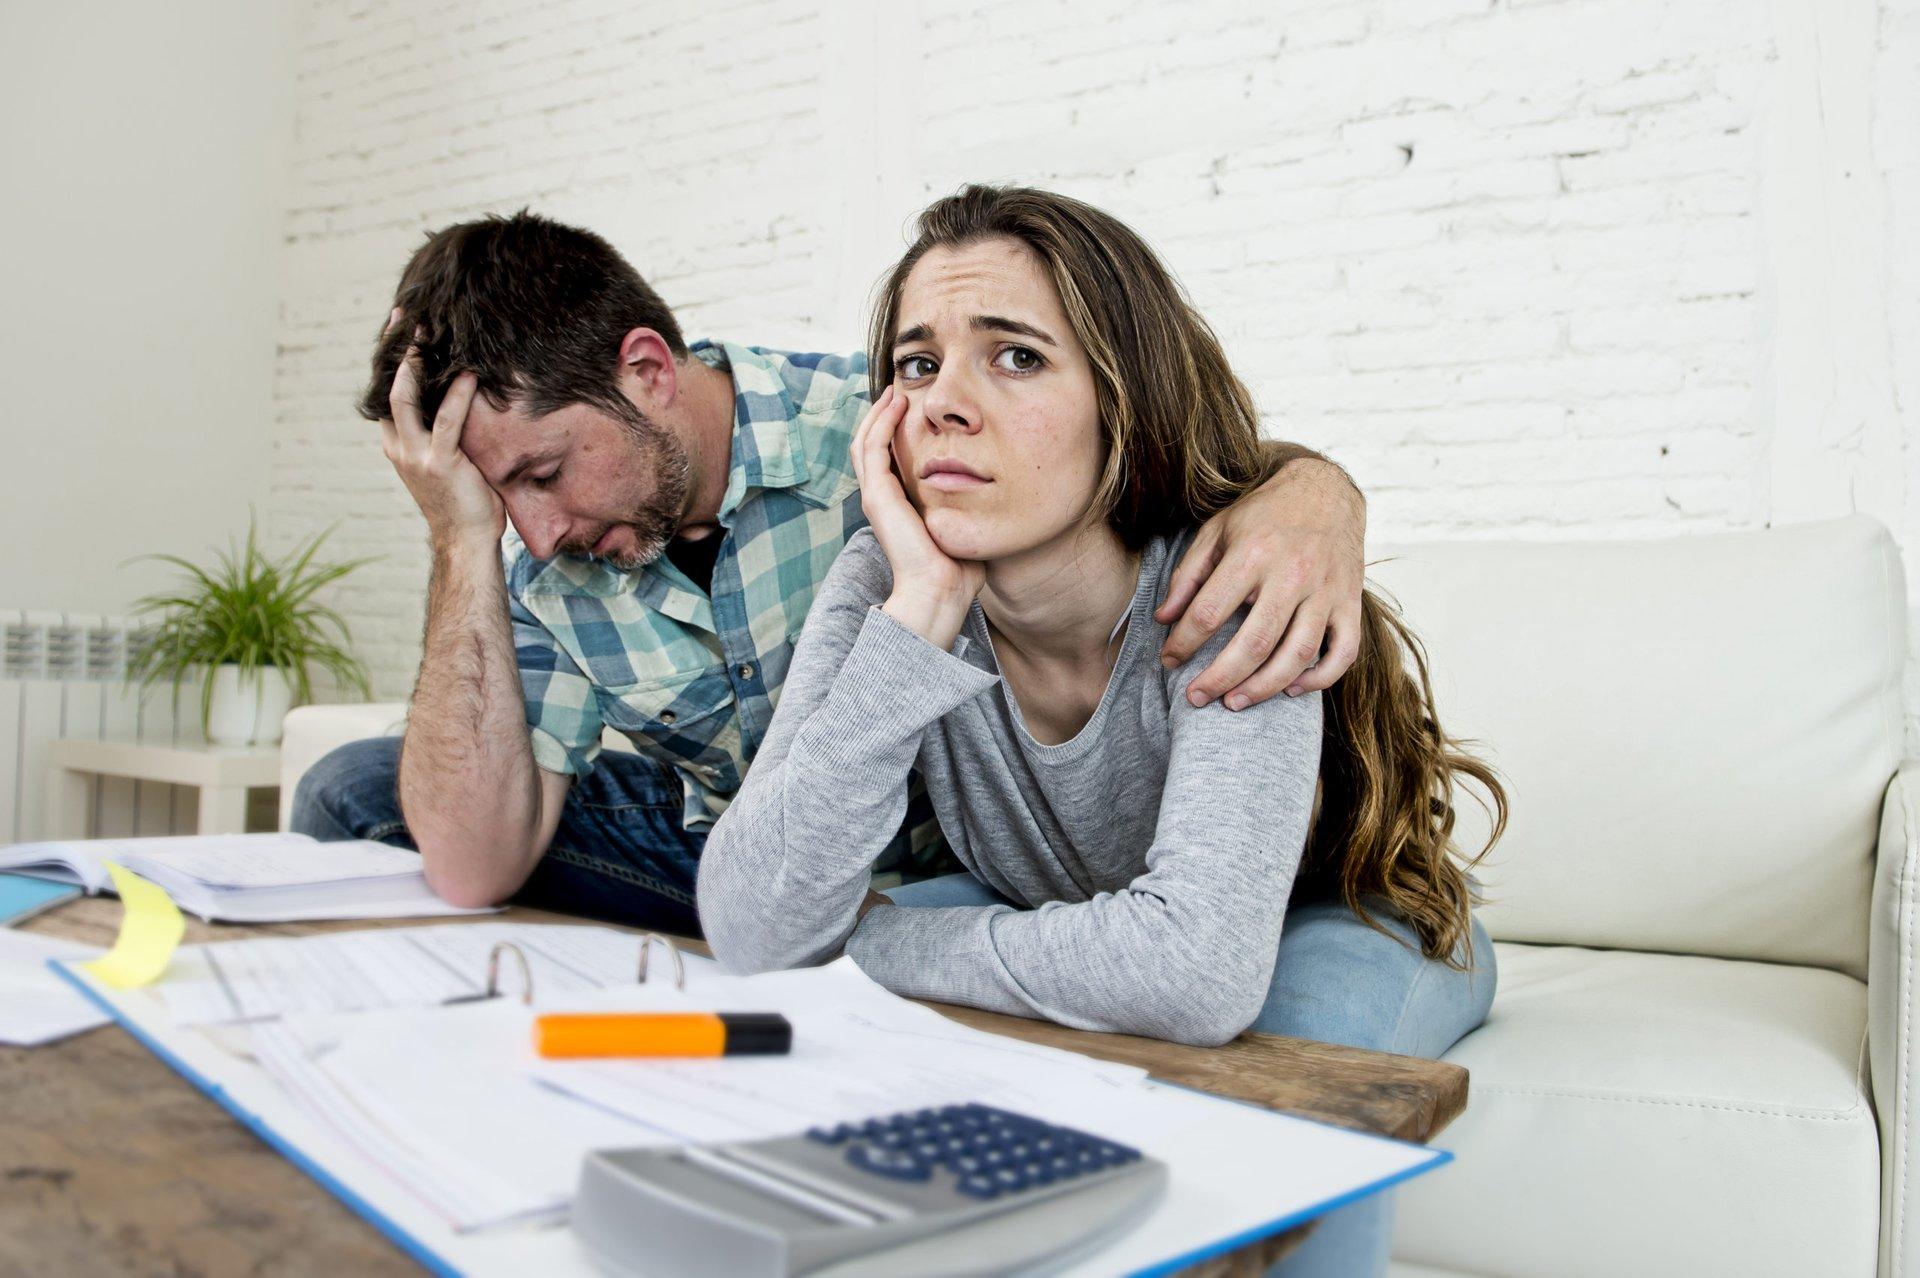 Sad couple with debt